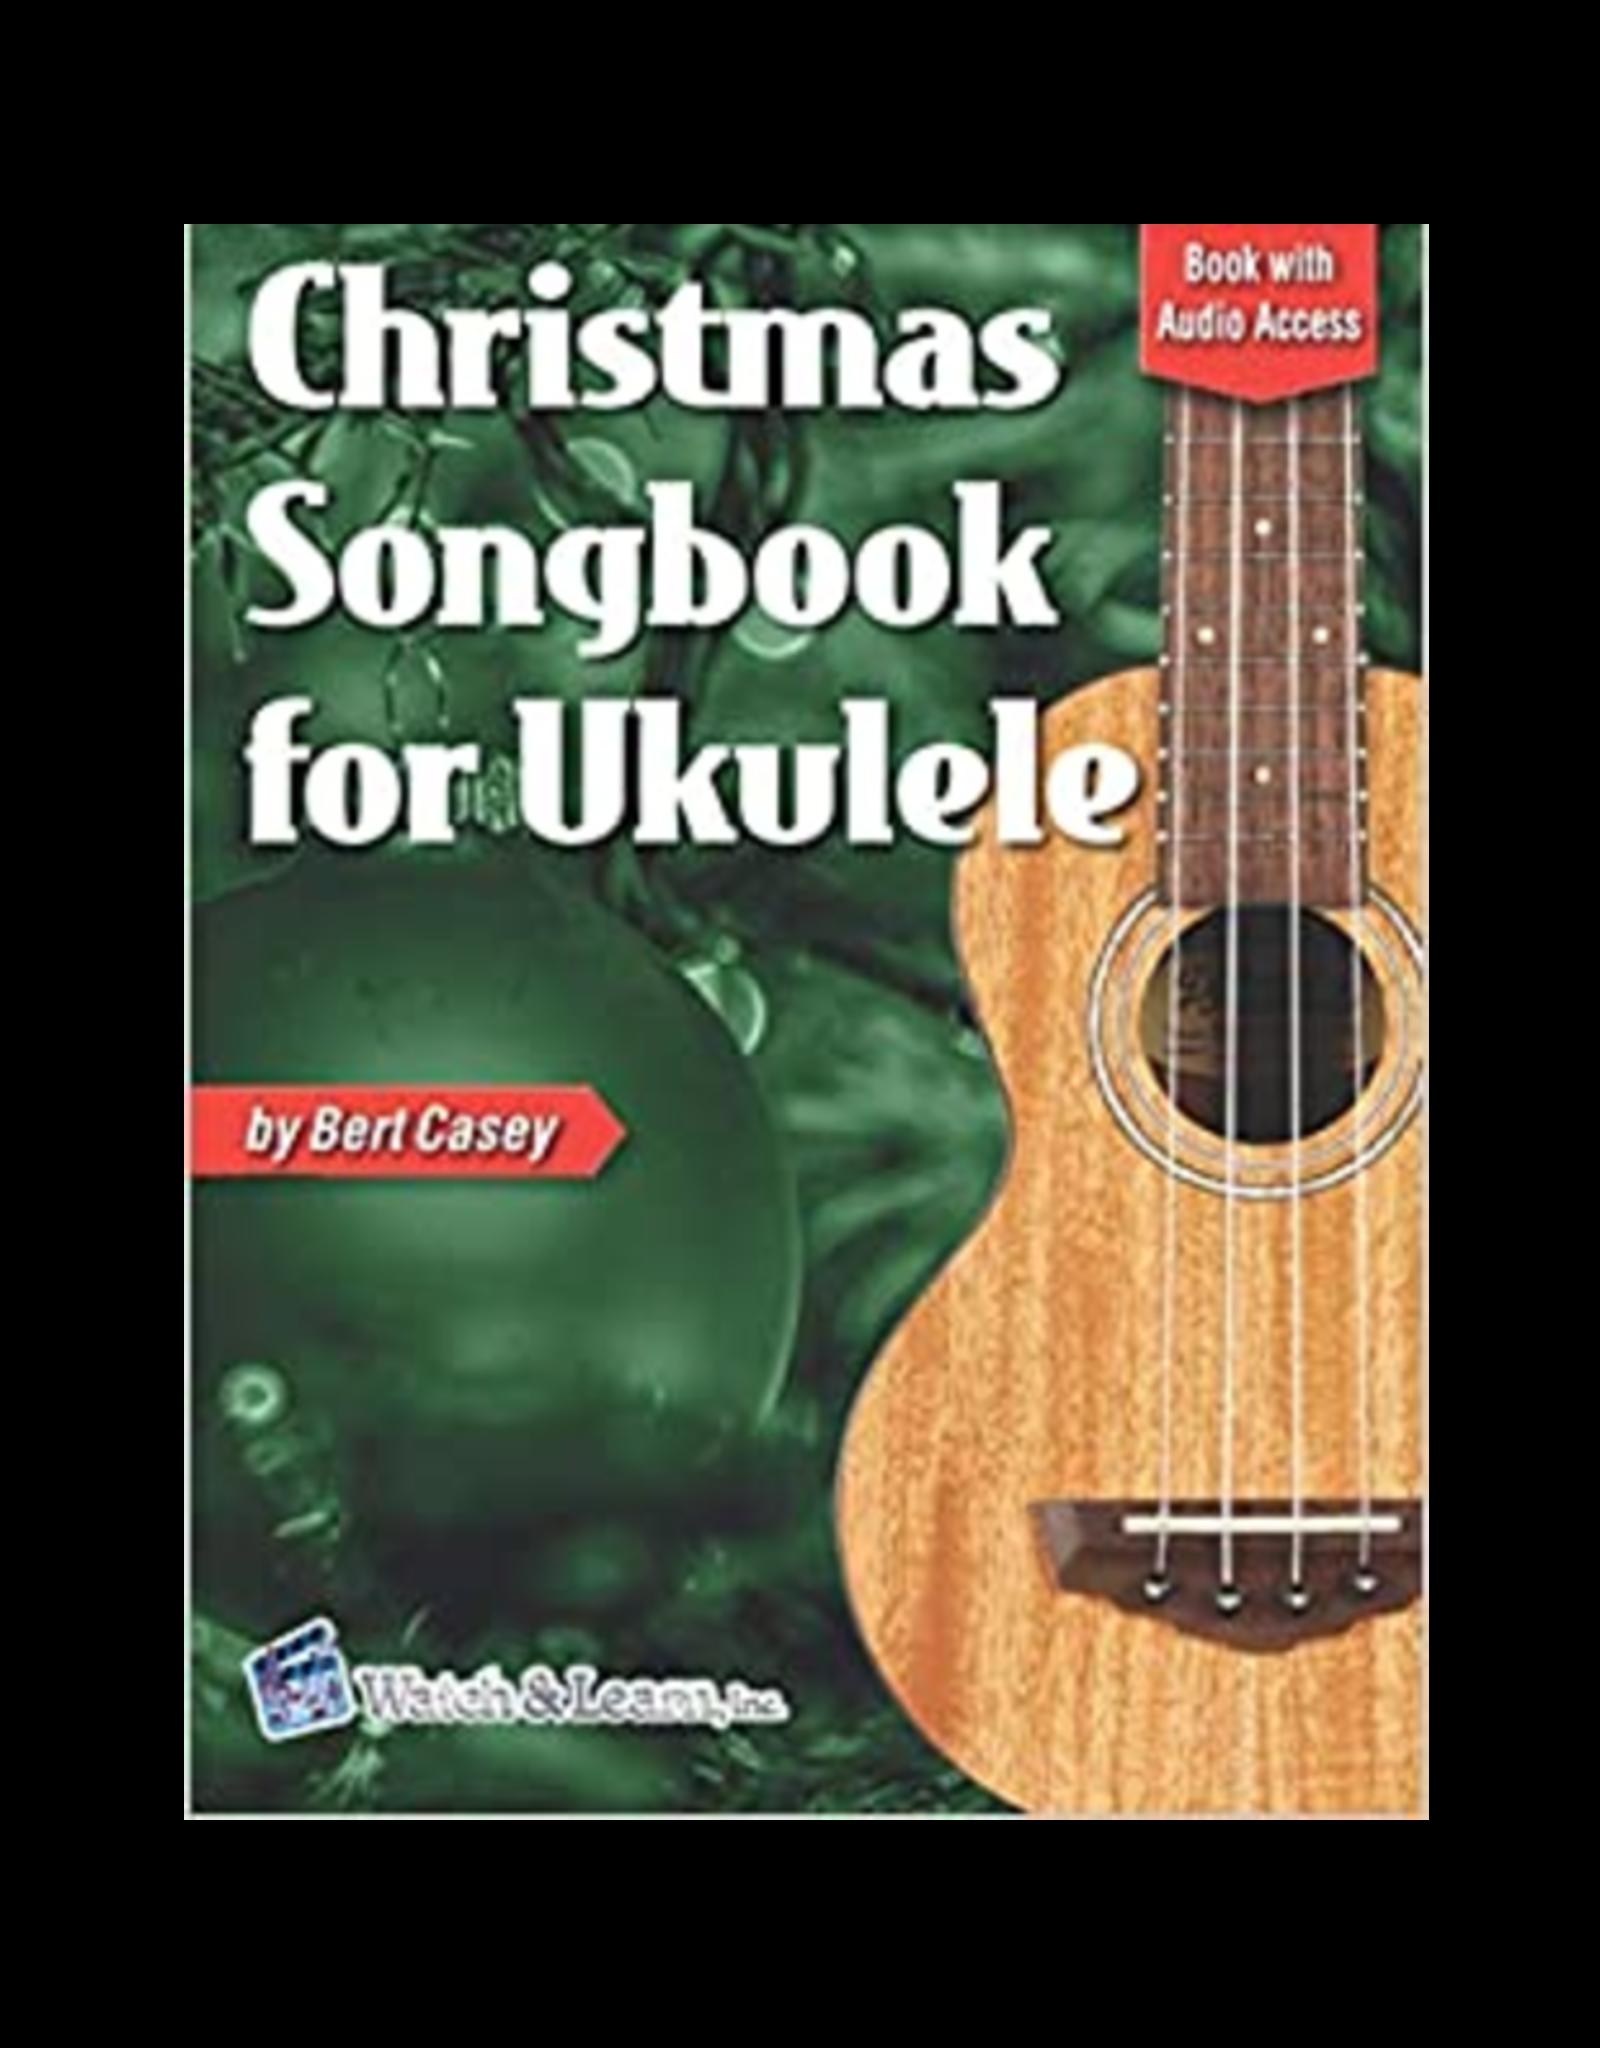 Watch & Learn Watch & Learn Easy Christmas Songbook for Ukulele